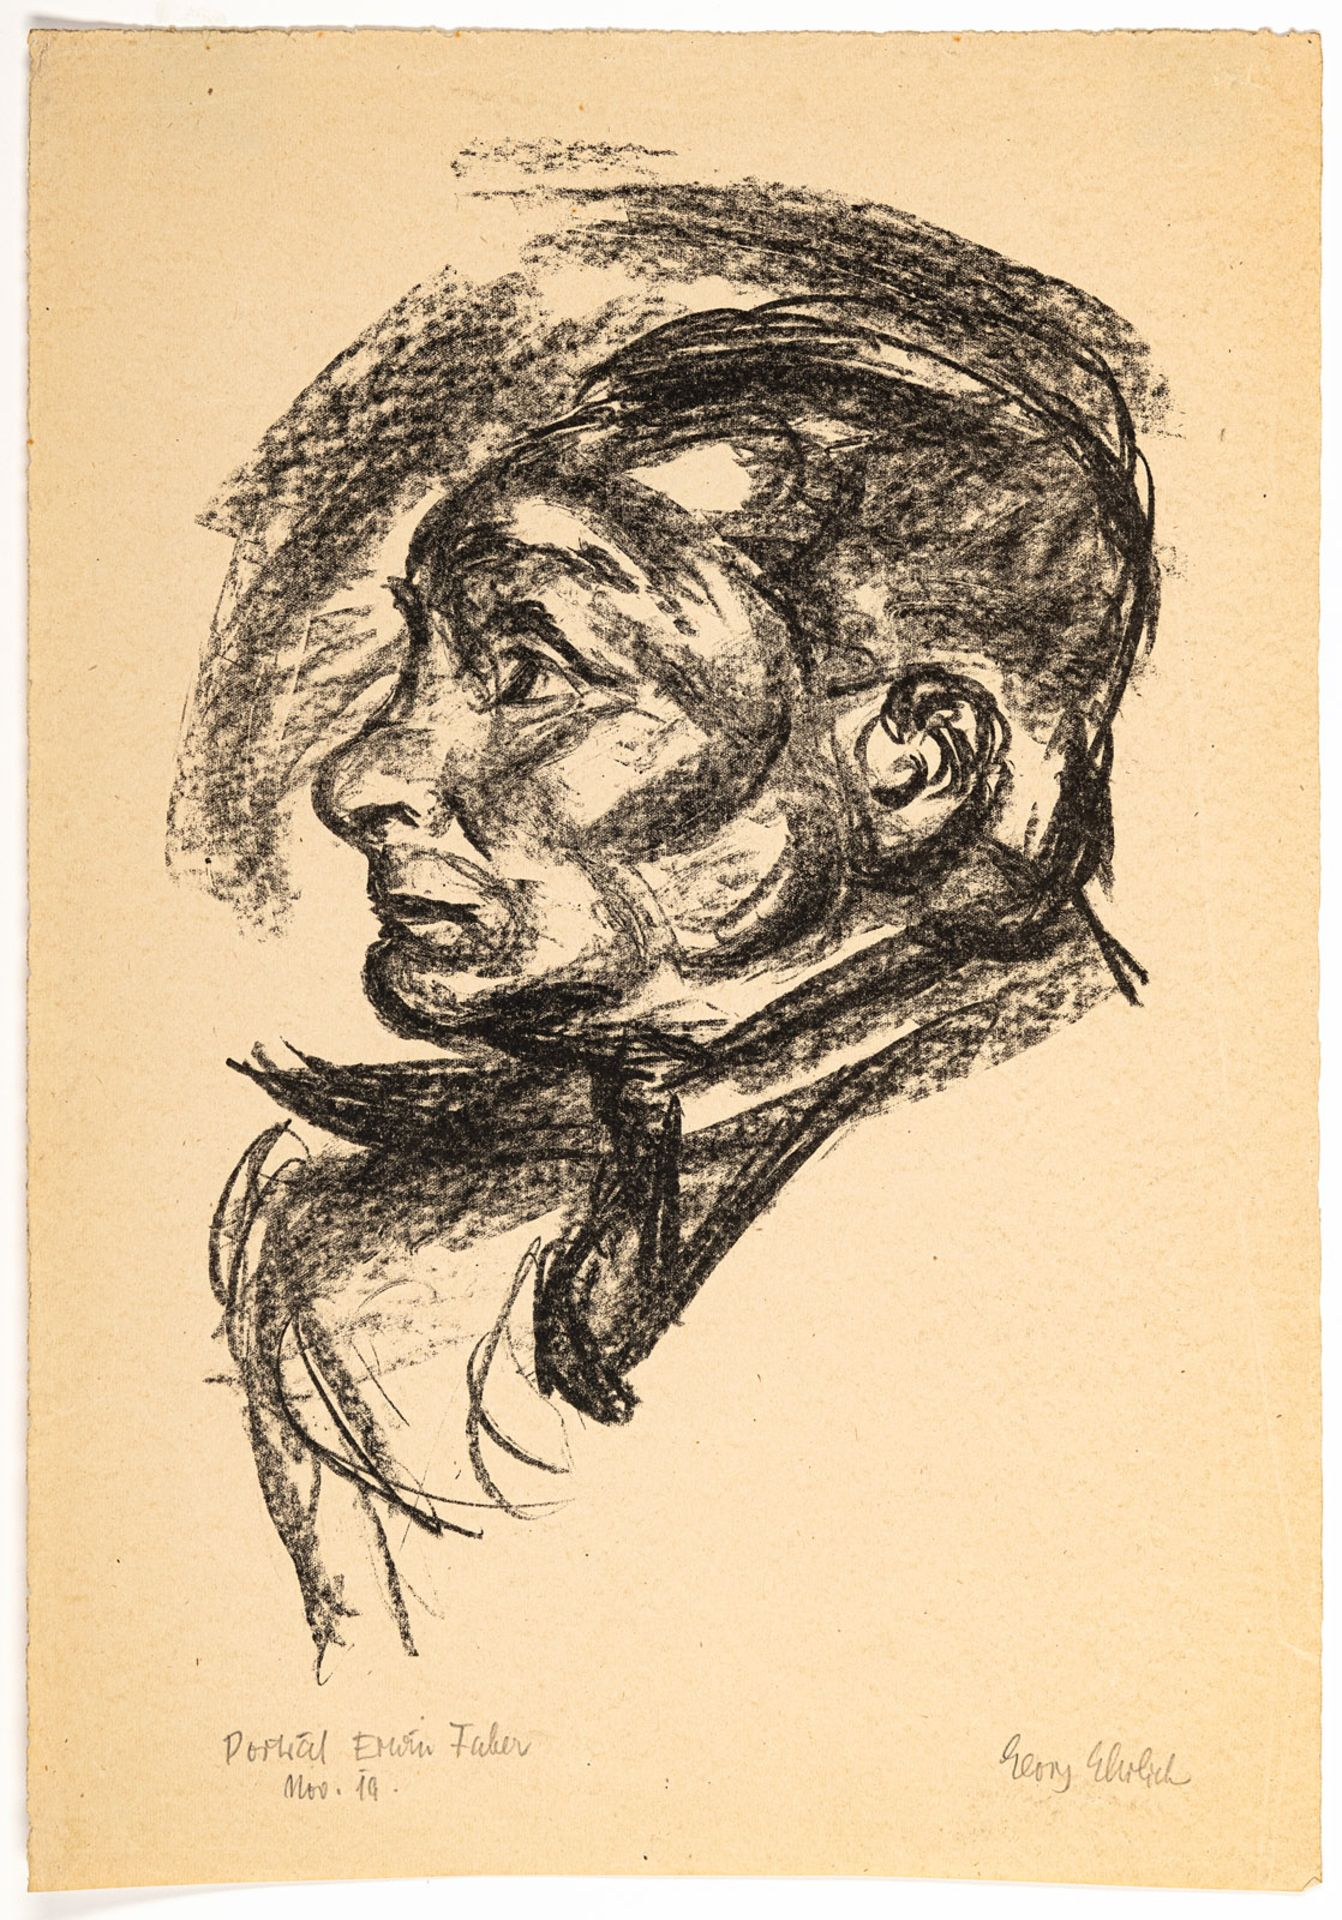 Ehrlich, Georg - Image 6 of 6